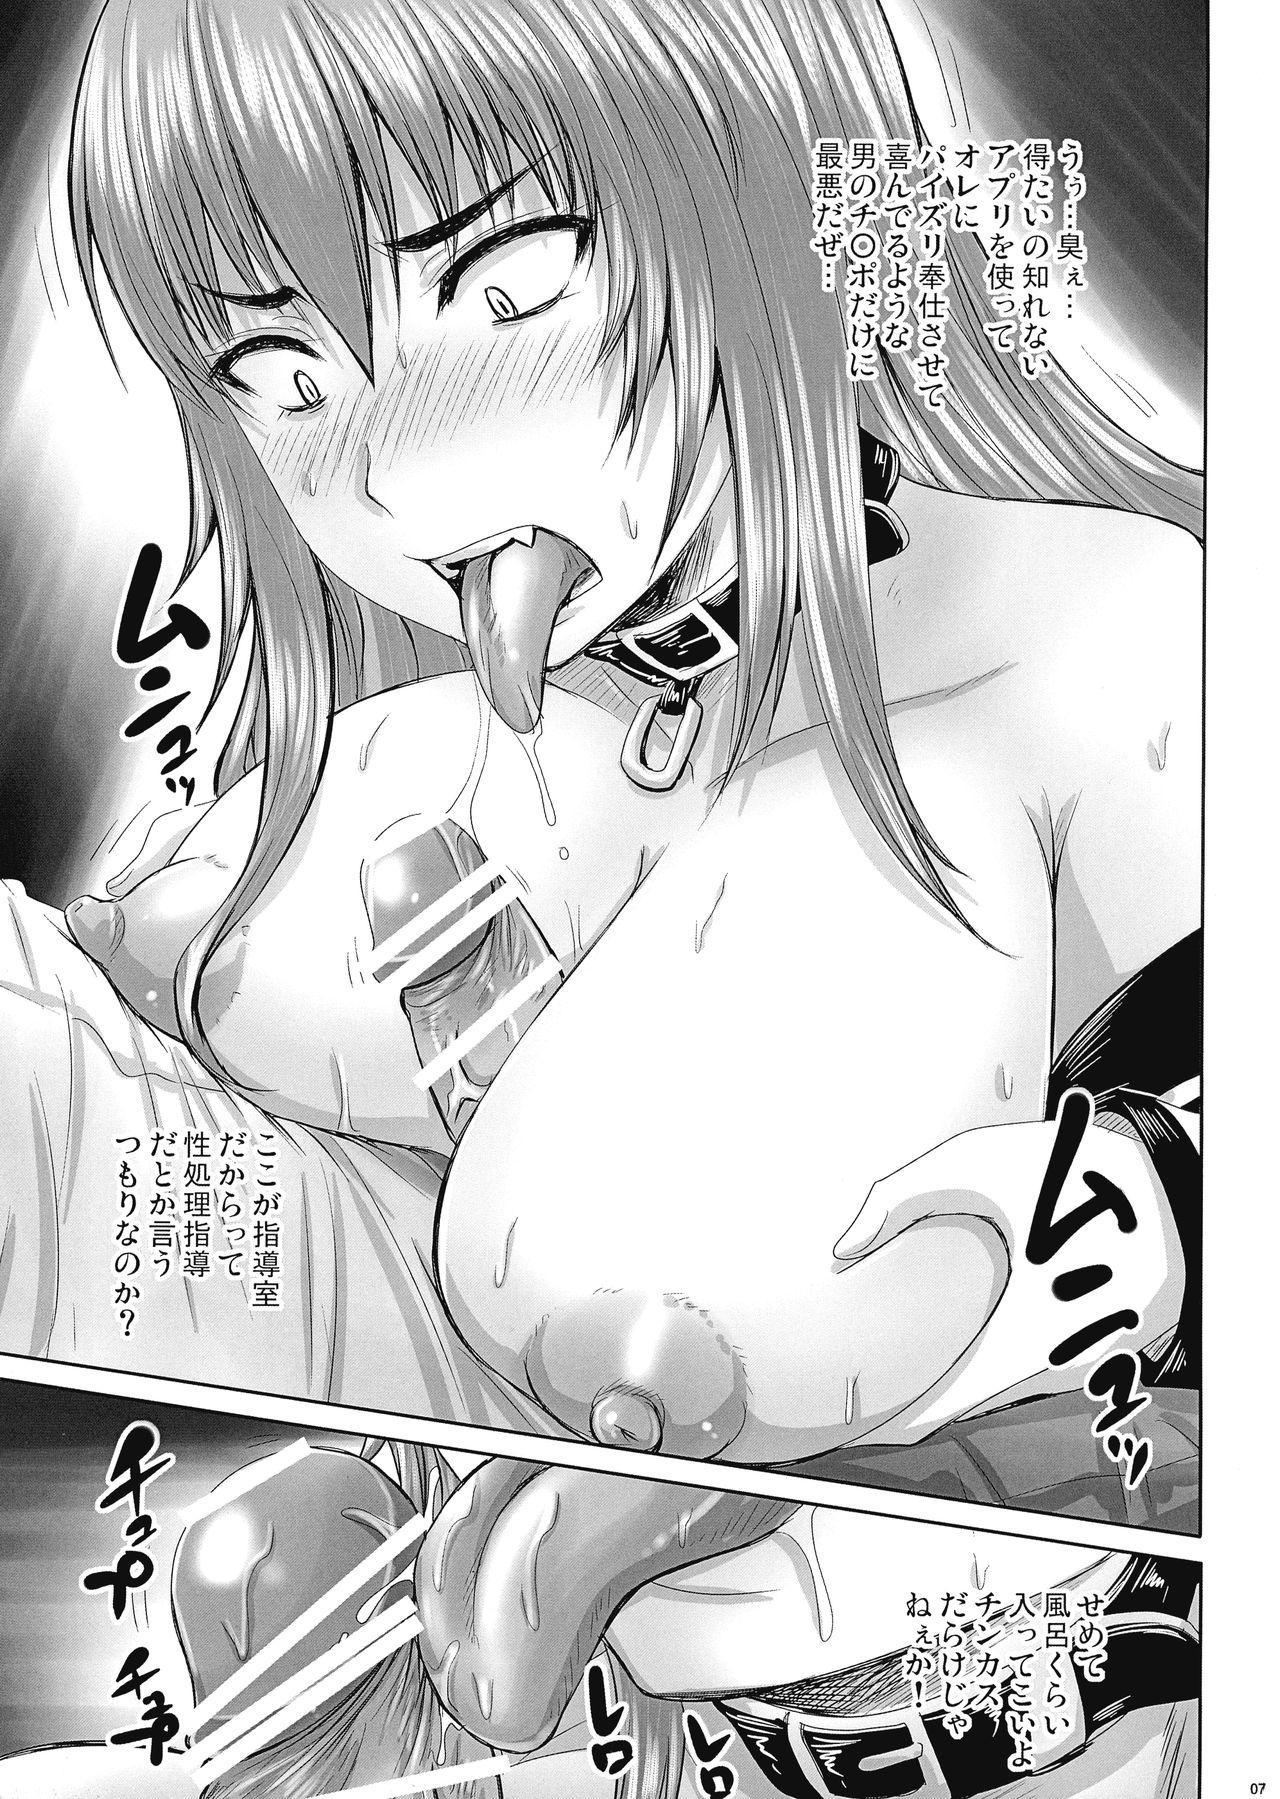 Aruhi no Kyouhime 8